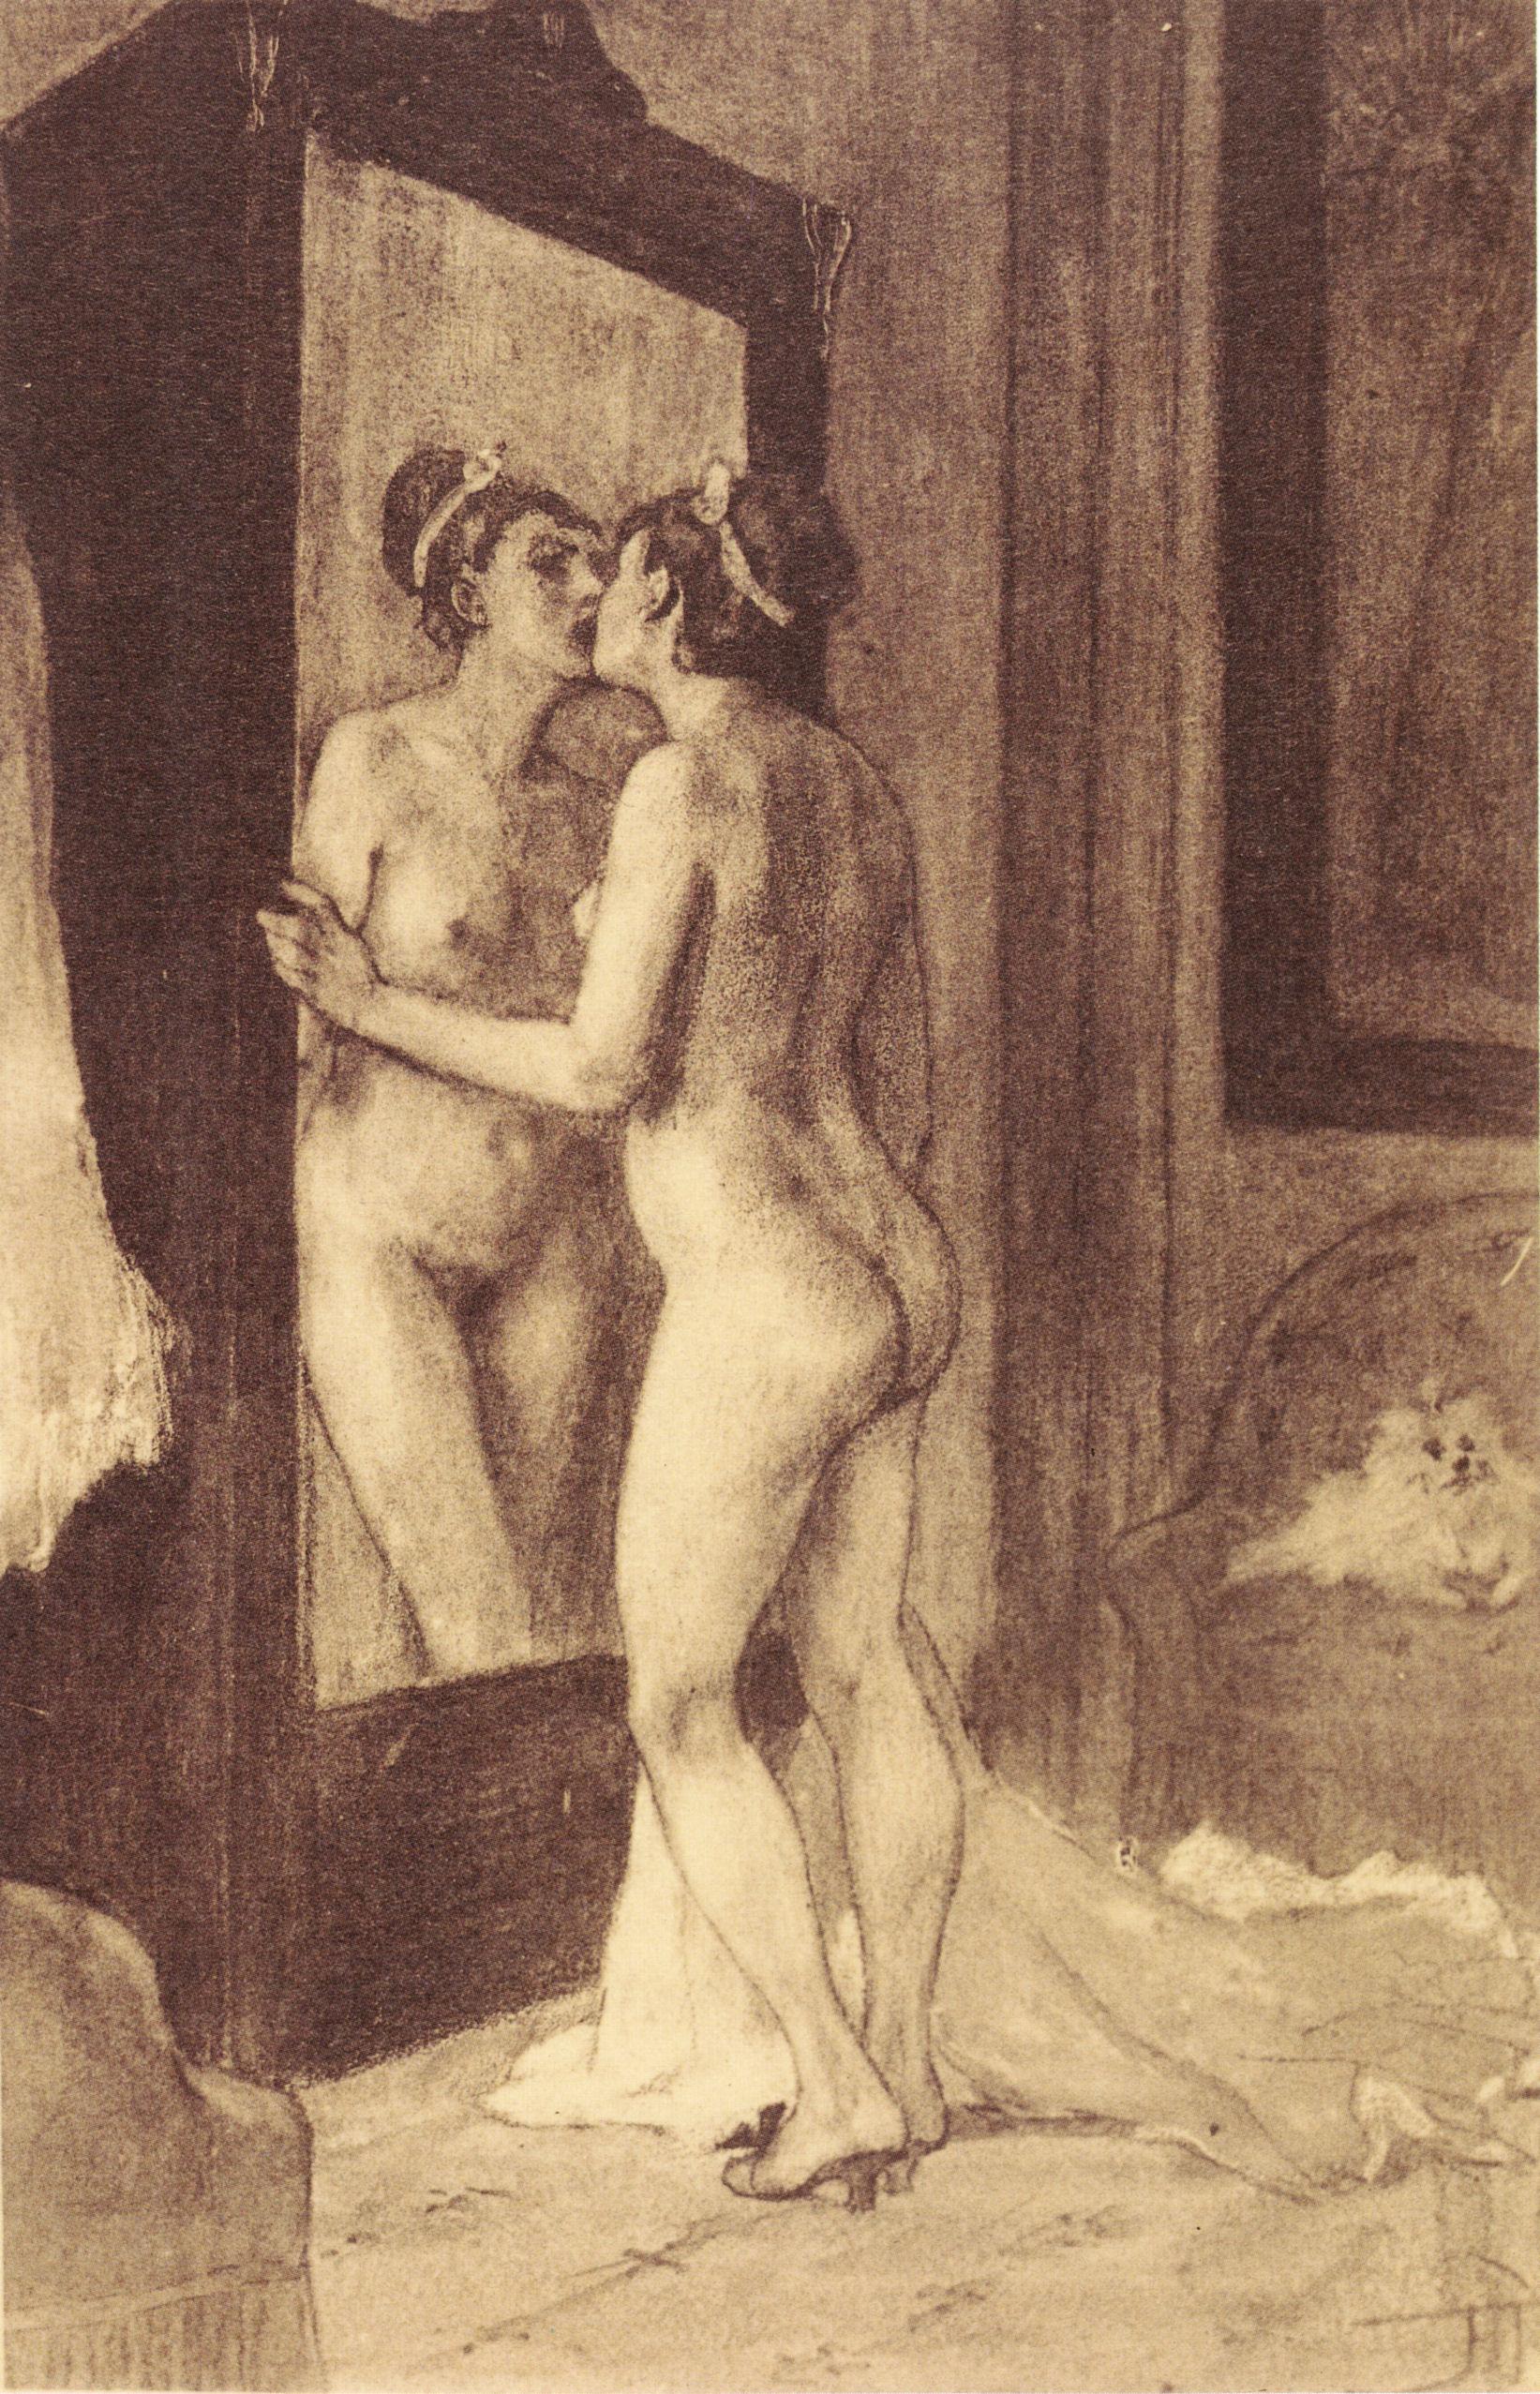 video porno gay francais escort girl corbeil essonne